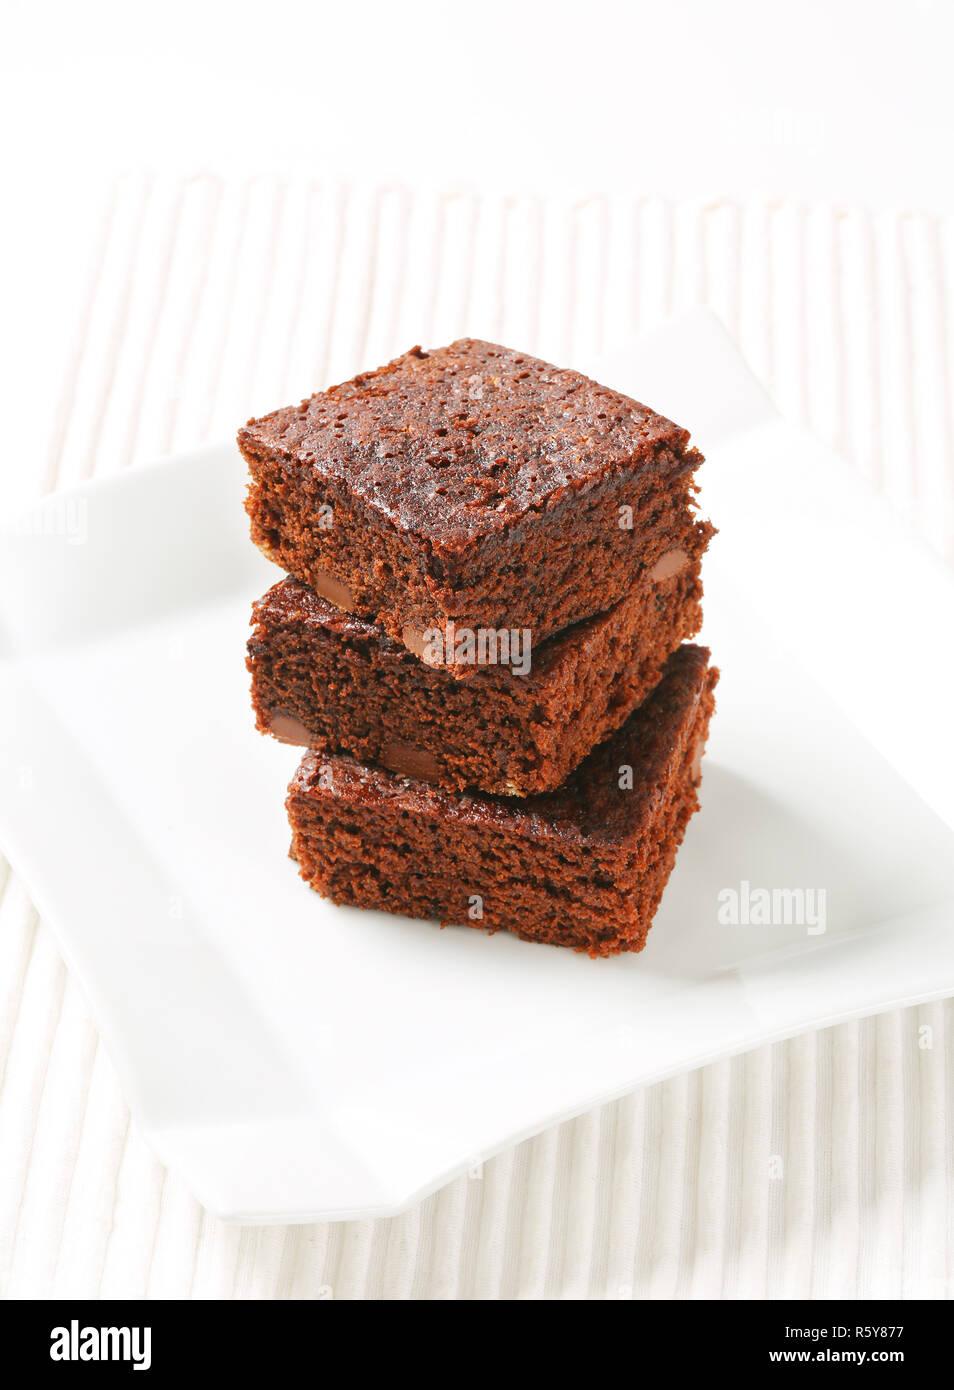 Chocolate Chip Brownies - Stock Image